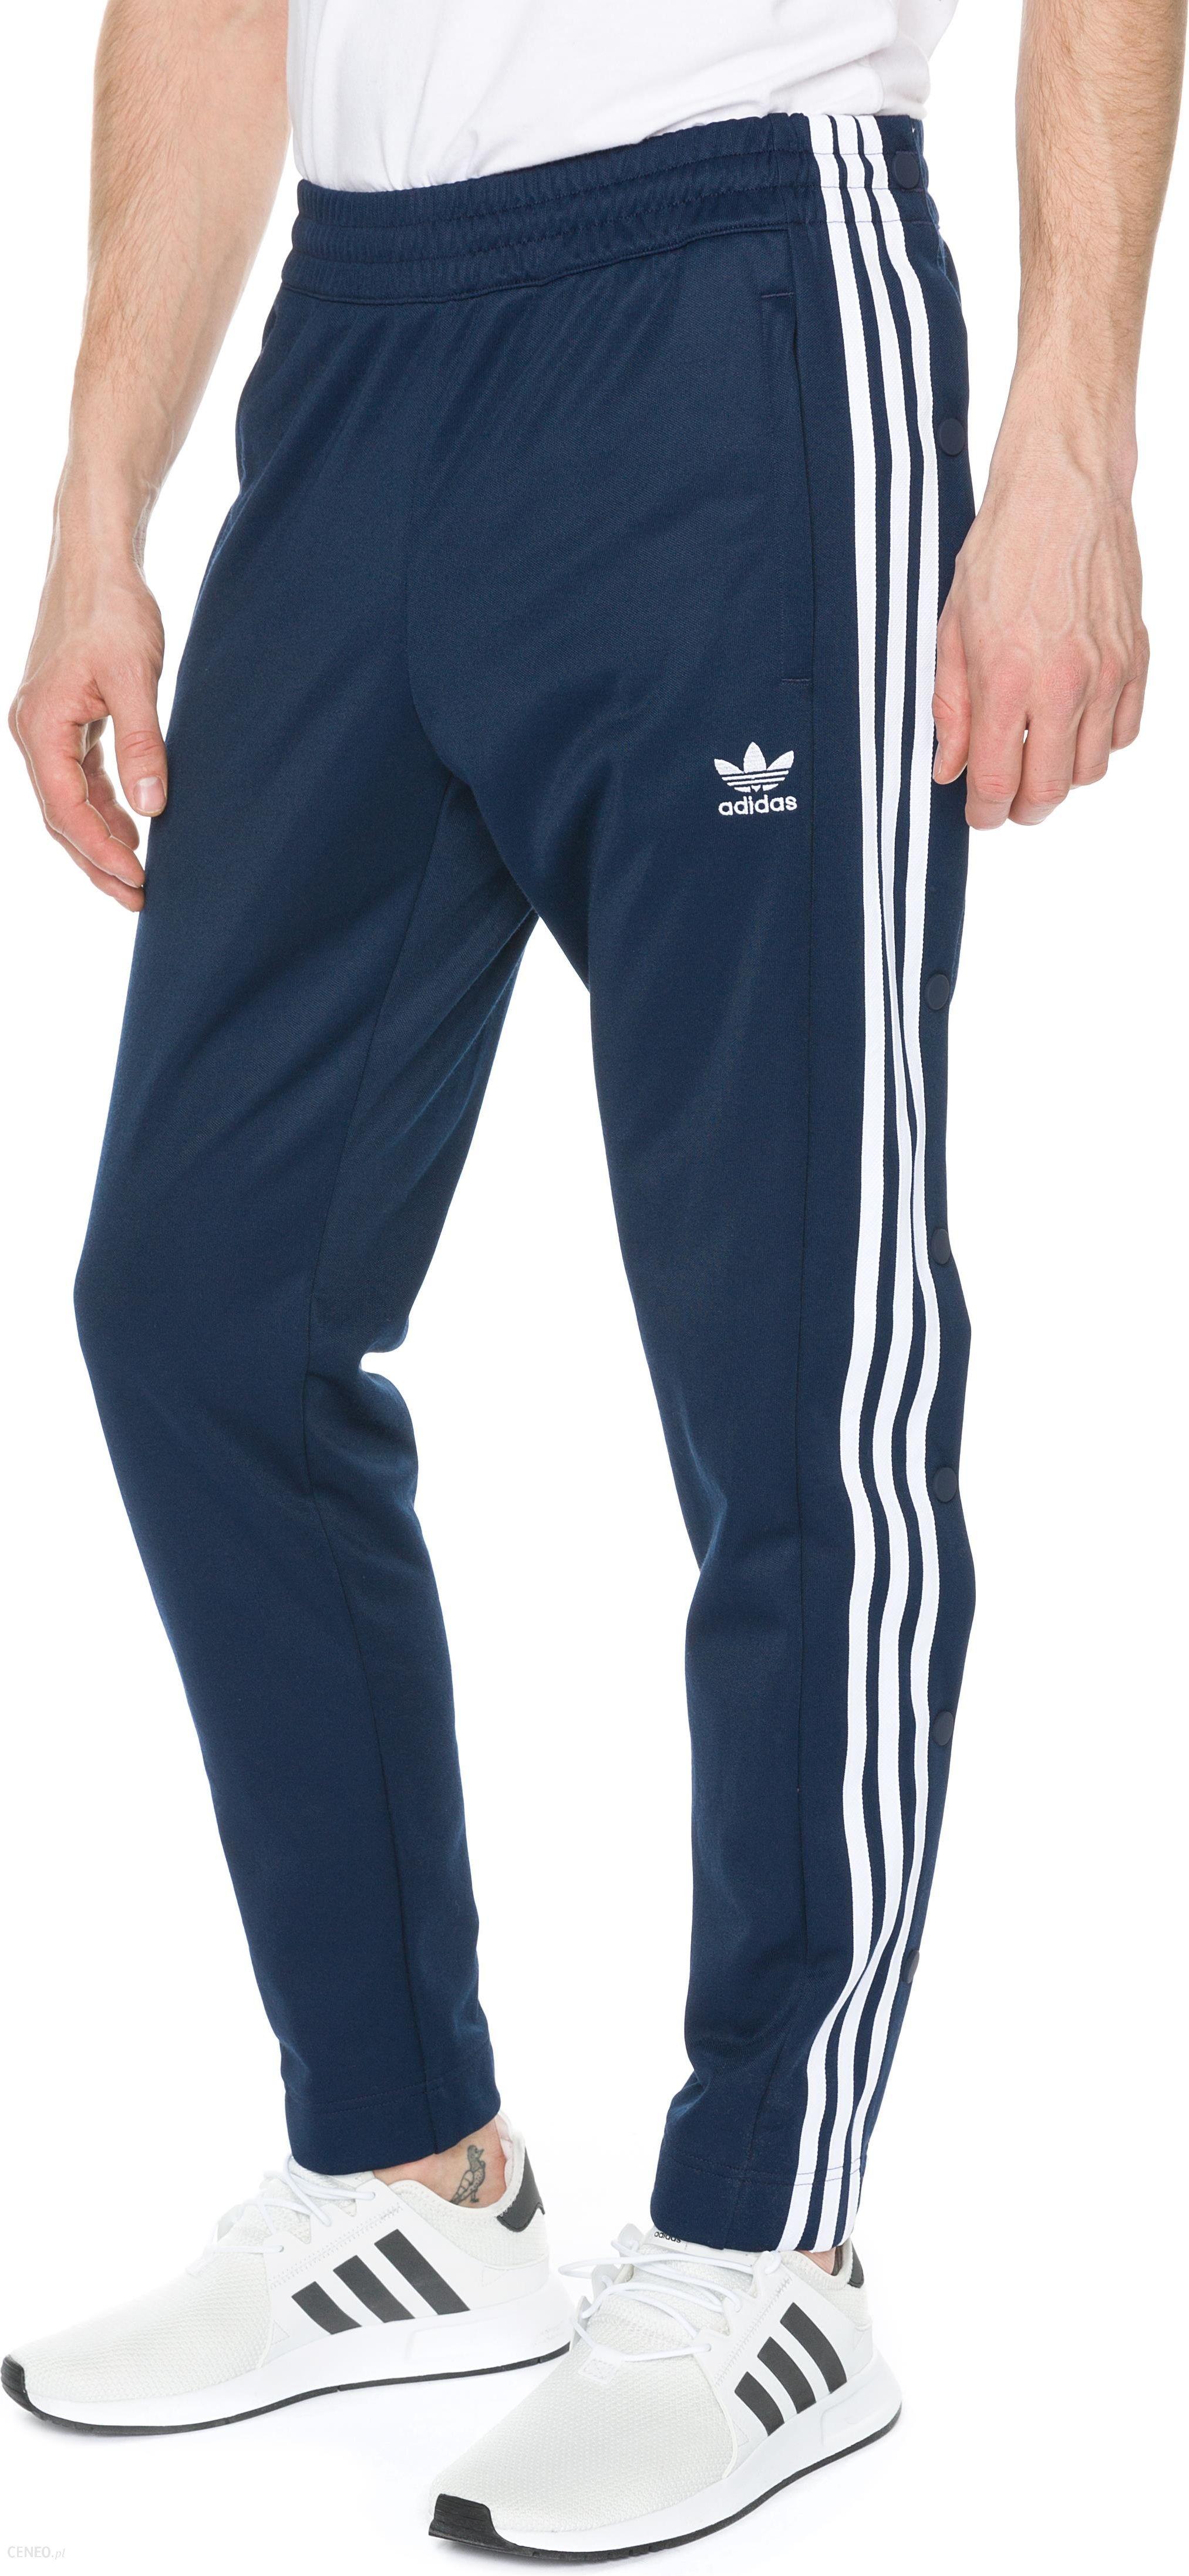 Tanie Adidas Originals Adi Break Logo T shirty Damskie